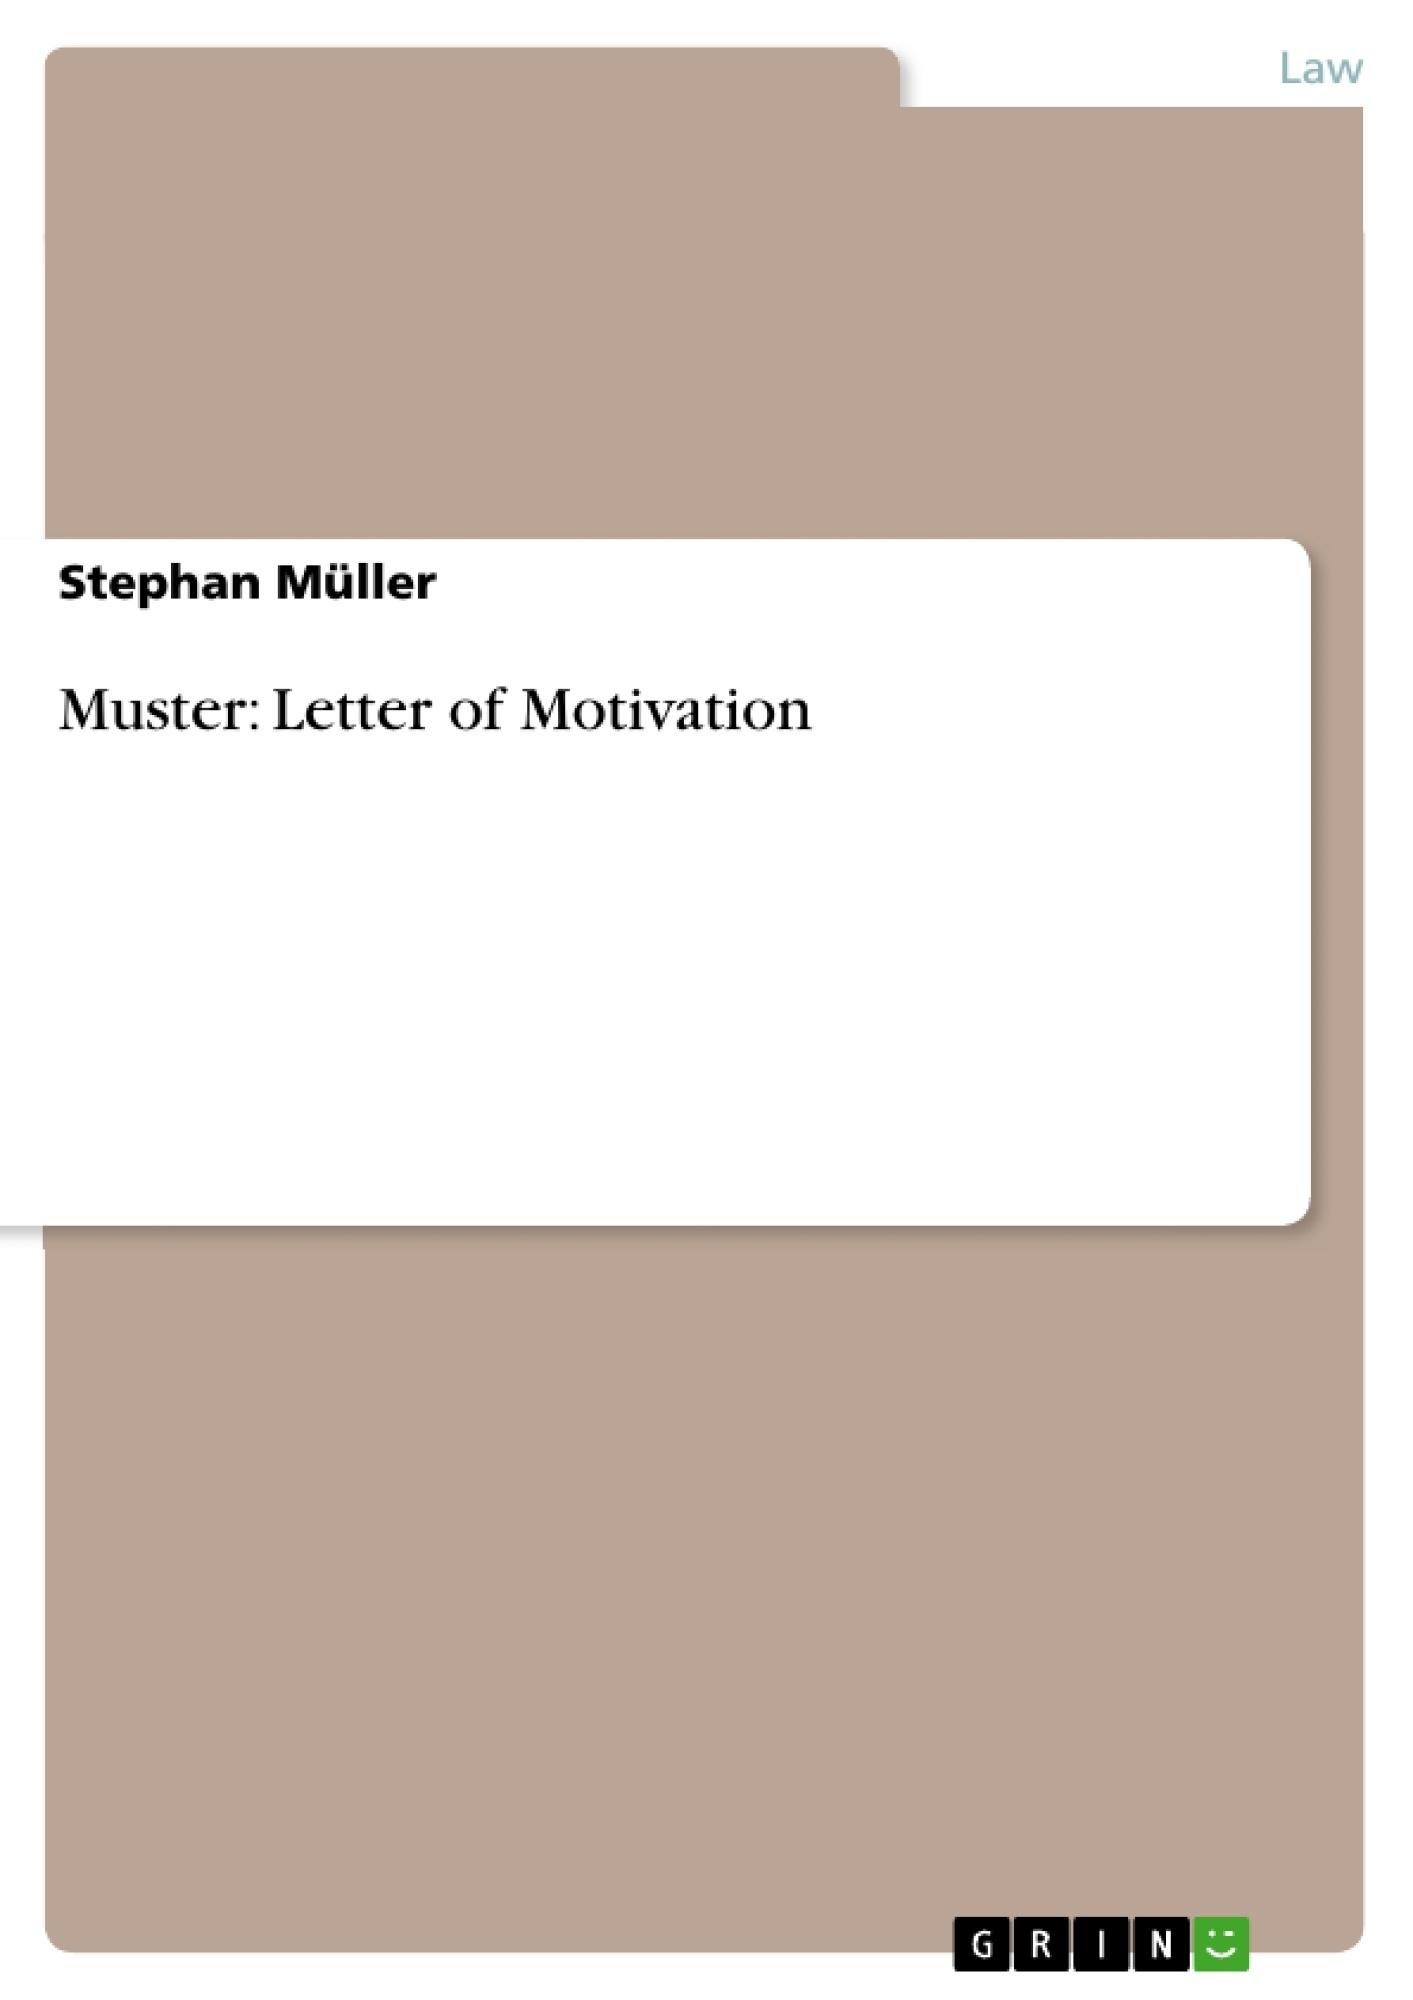 Title: Muster: Letter of Motivation